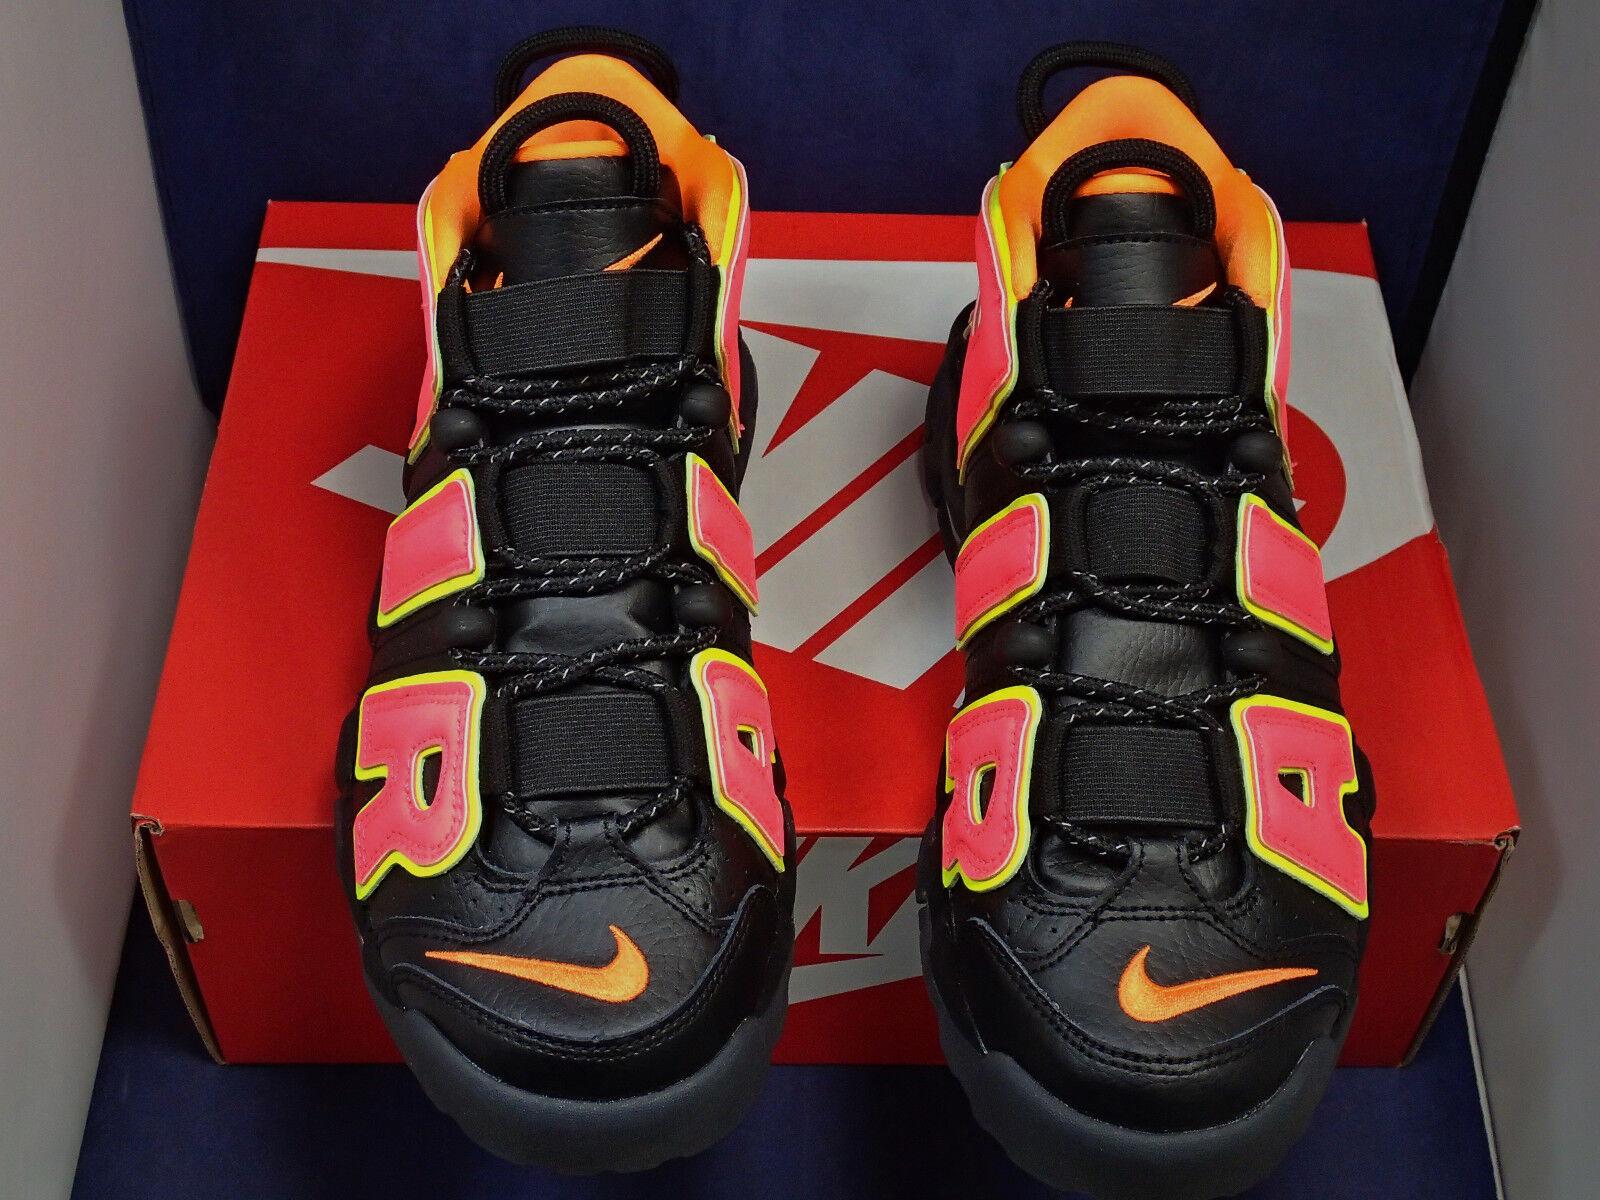 Nike Dimensioni 7,5 Nwob Volubile Da Rosa,   Da Volubile Ginnastica Verde 8bb326